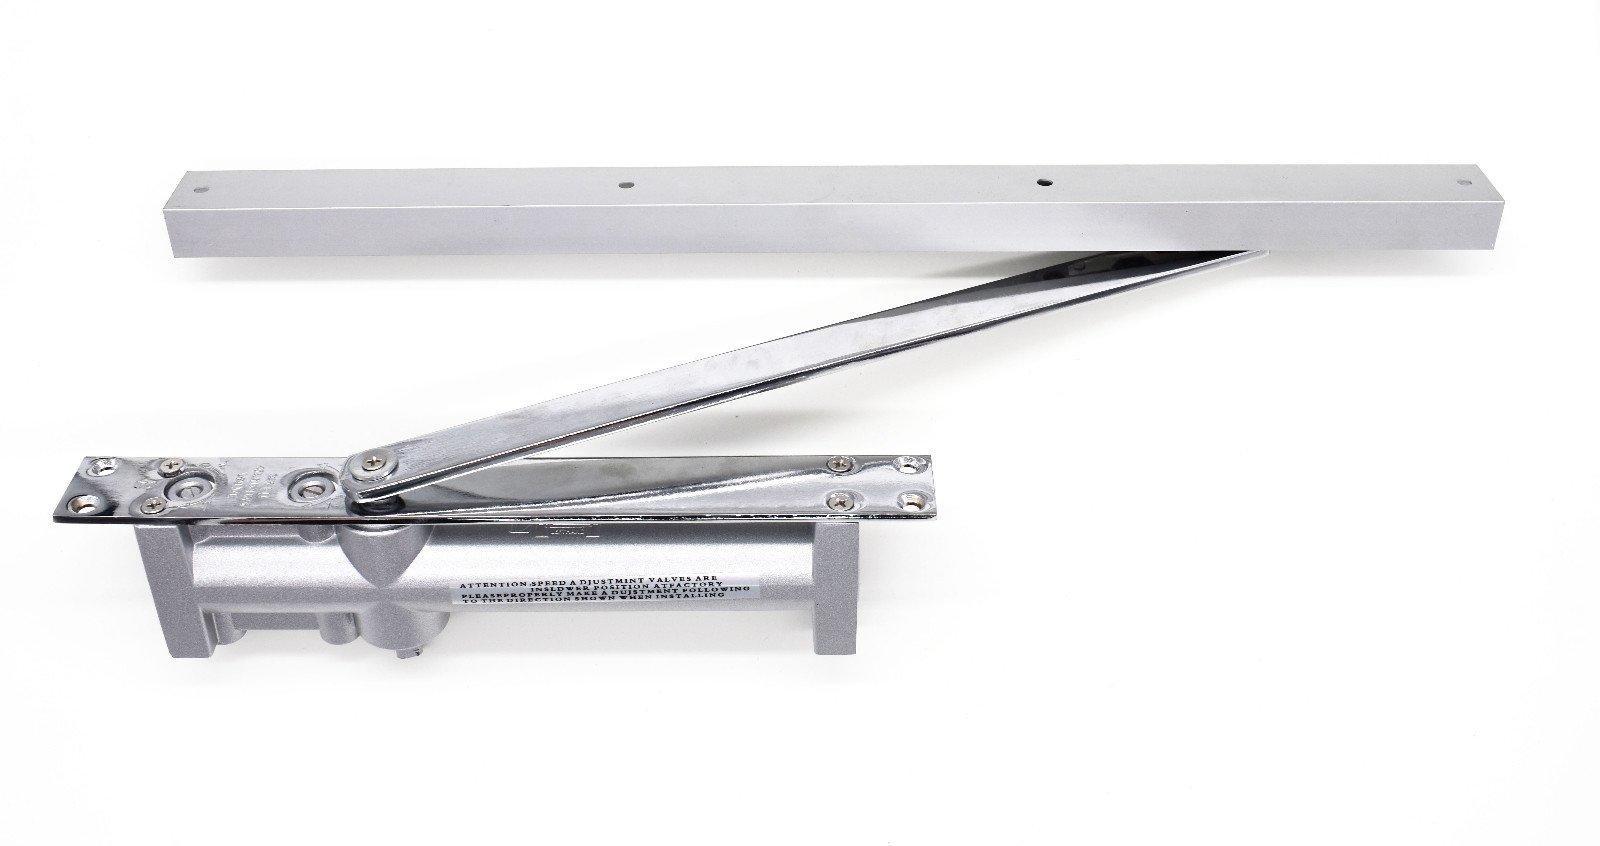 Kerui Furniture Hardware Brand automatic door closer